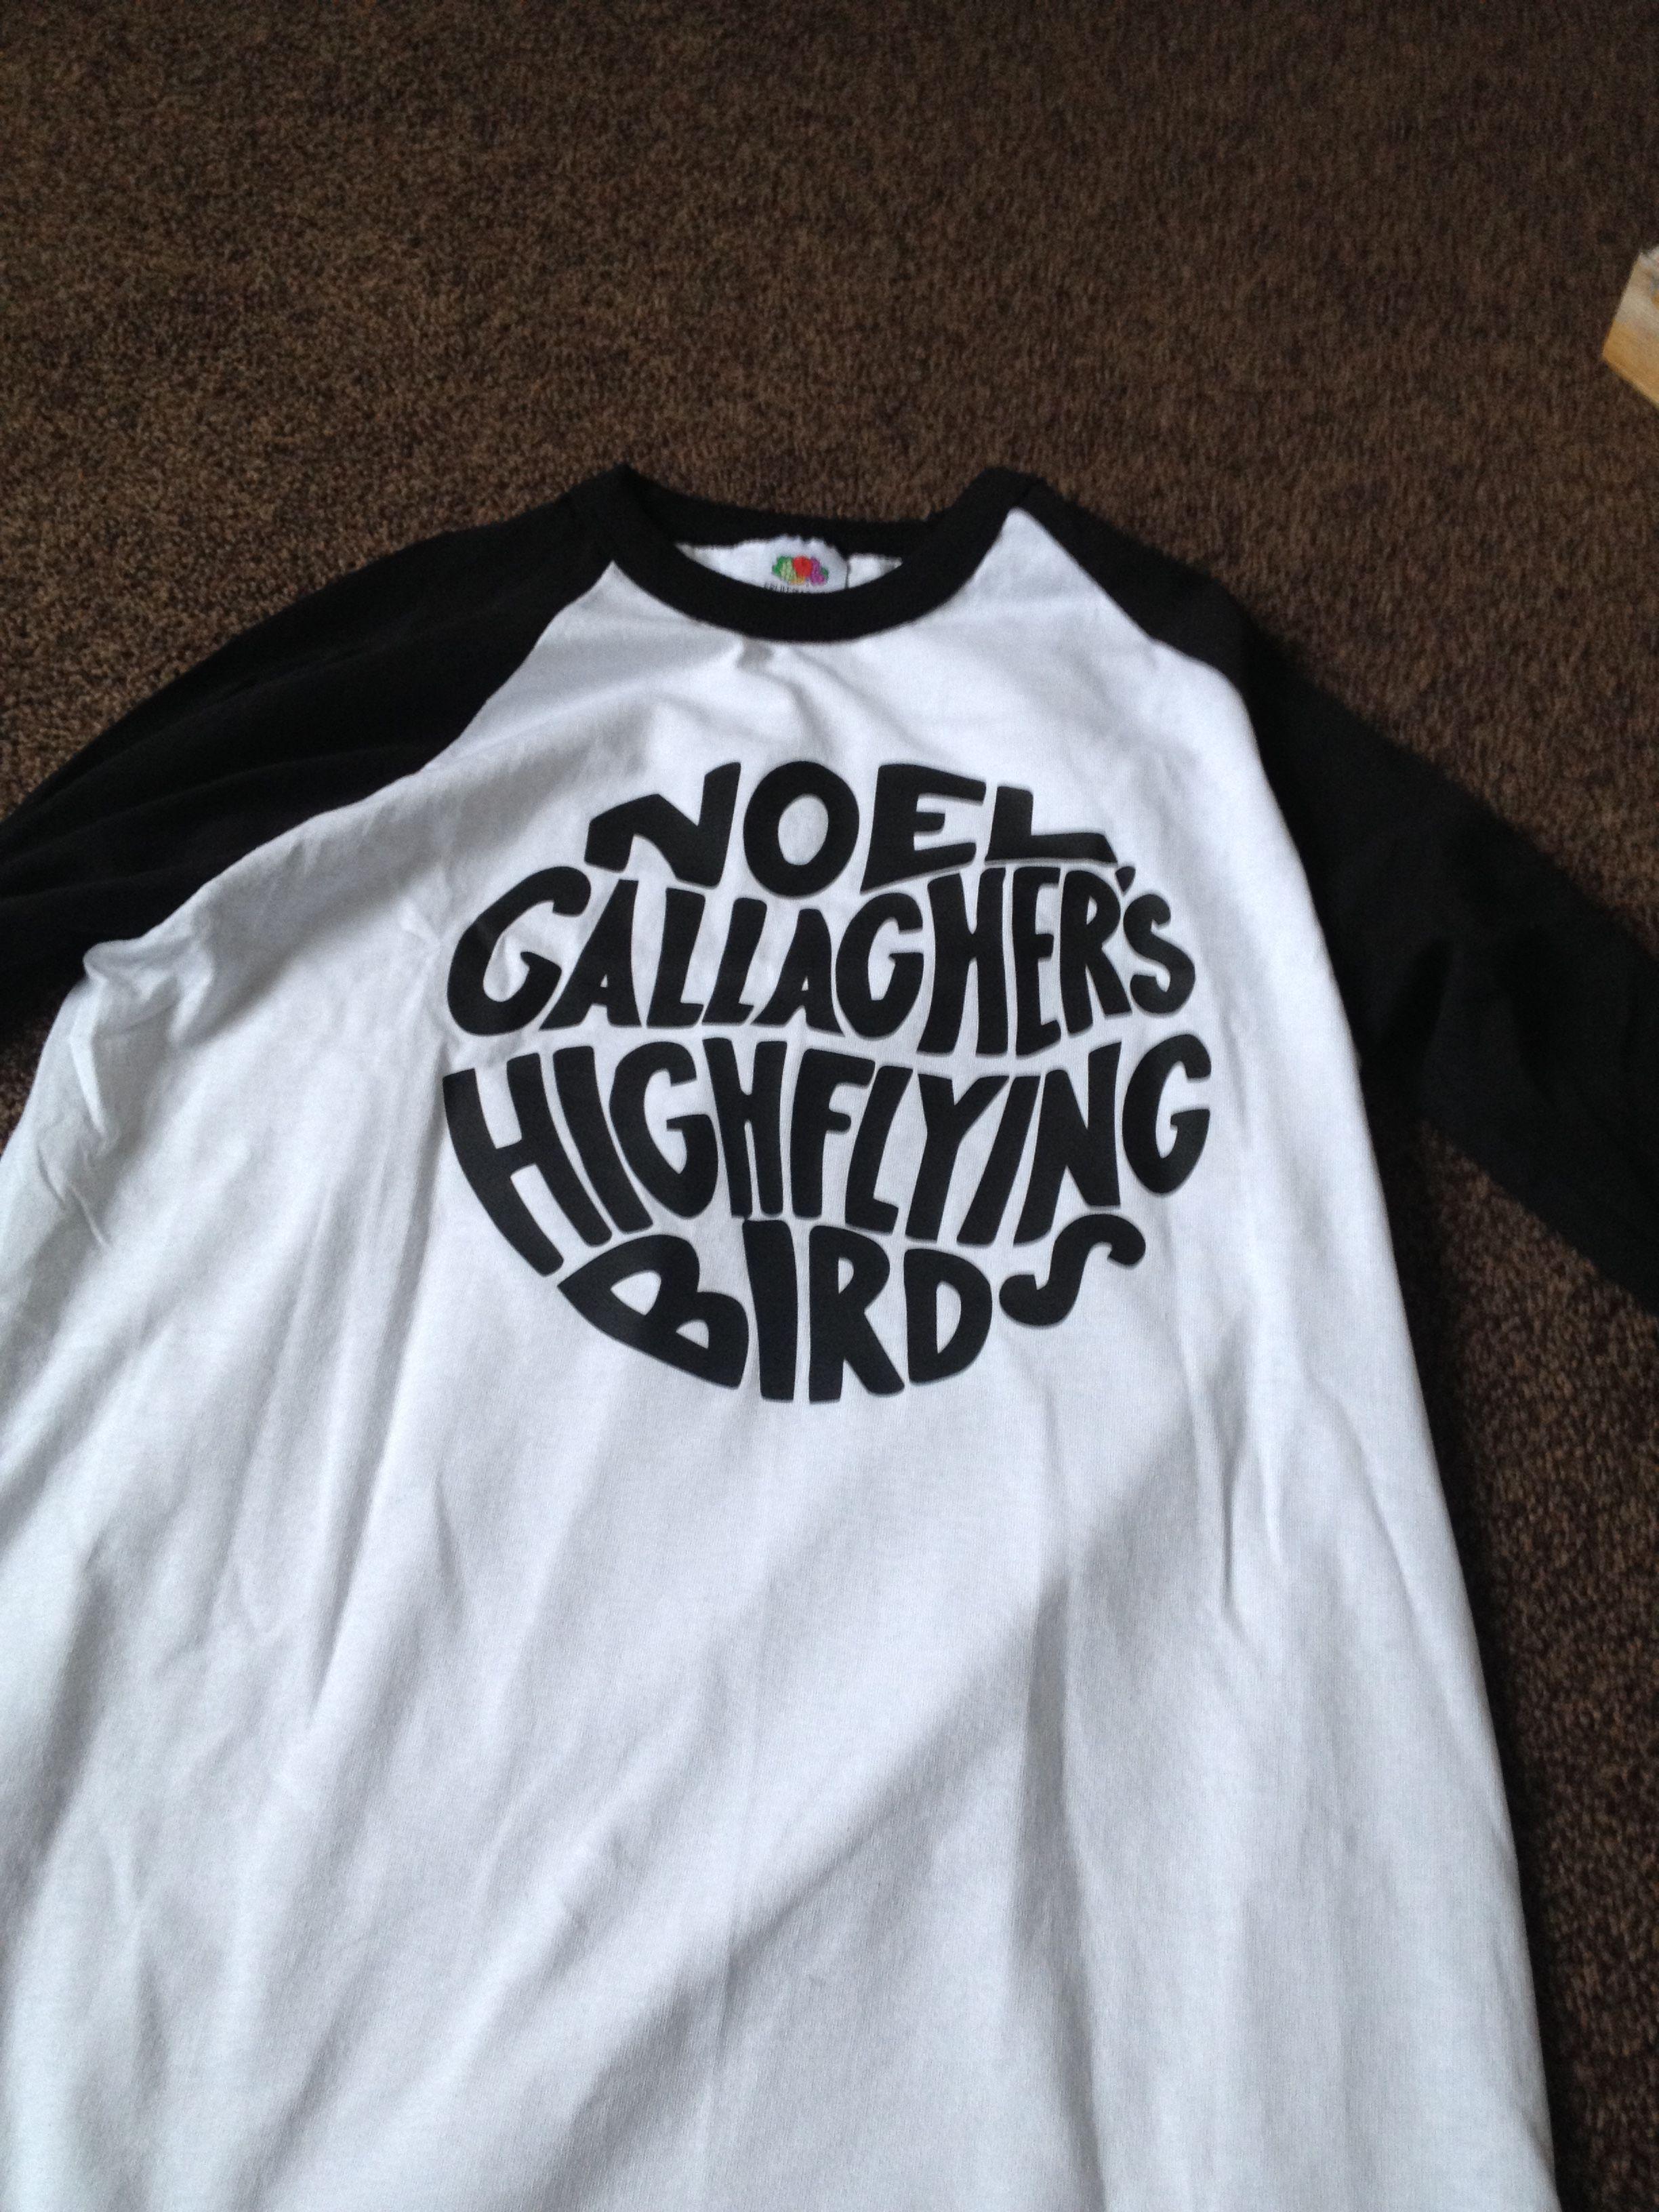 Noel Gallagher's high flying birds t shirts !!!